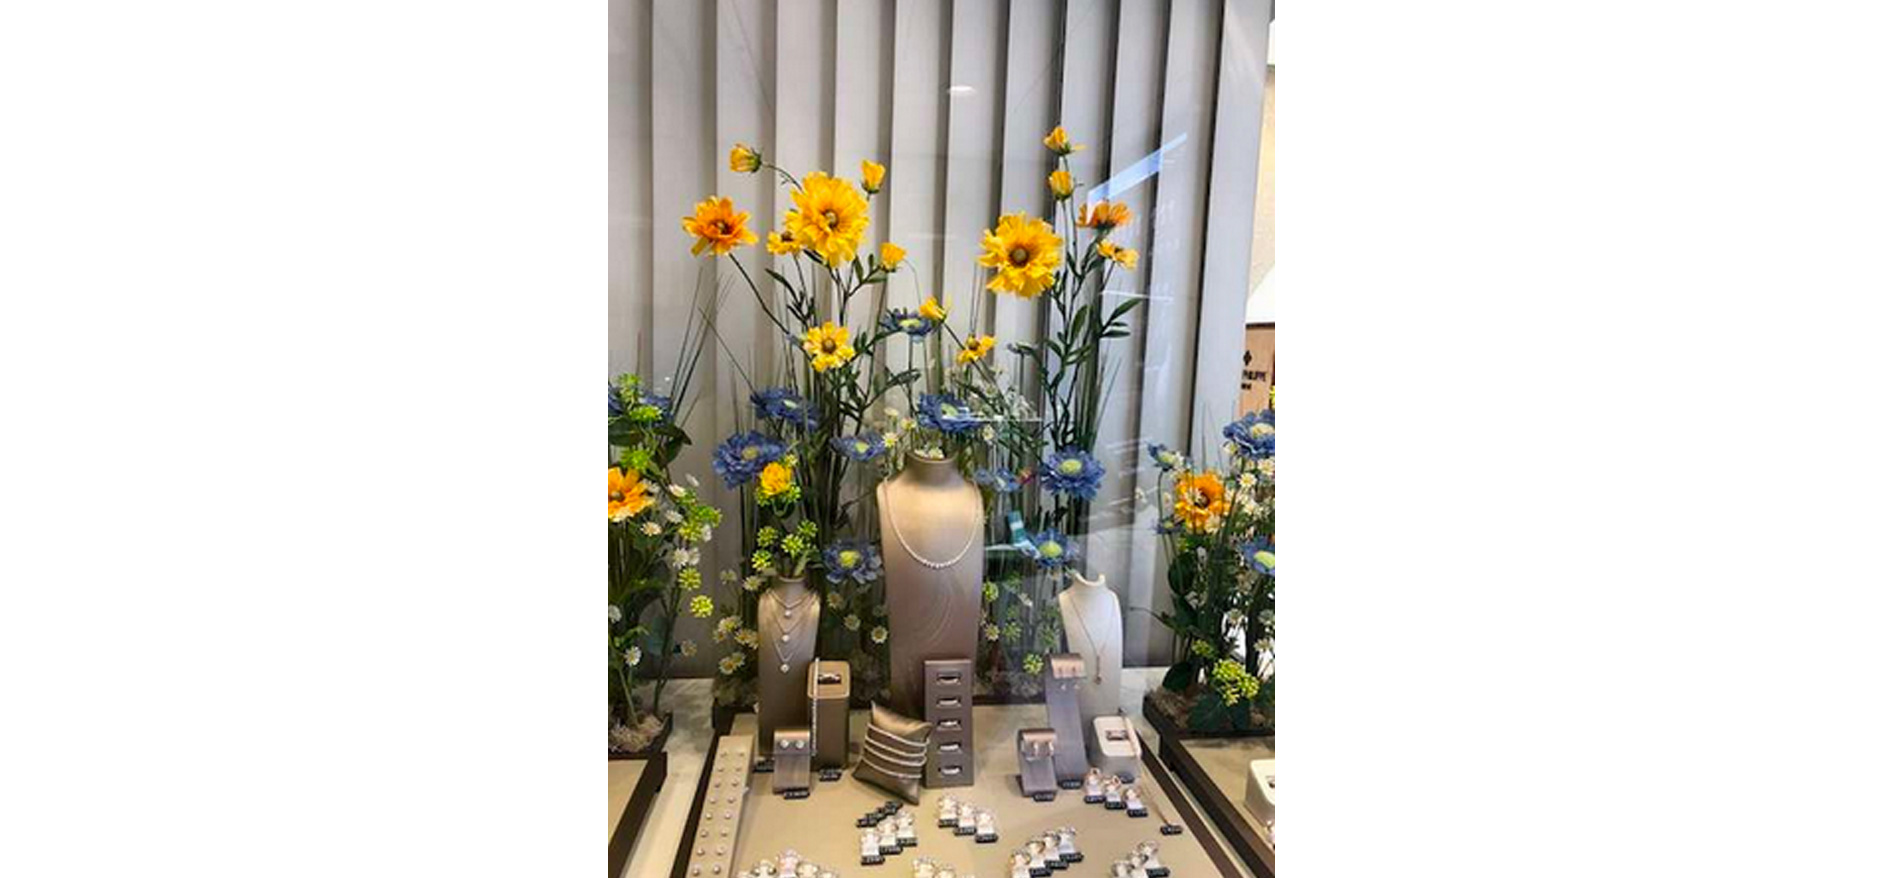 Jewellery displays with flowers